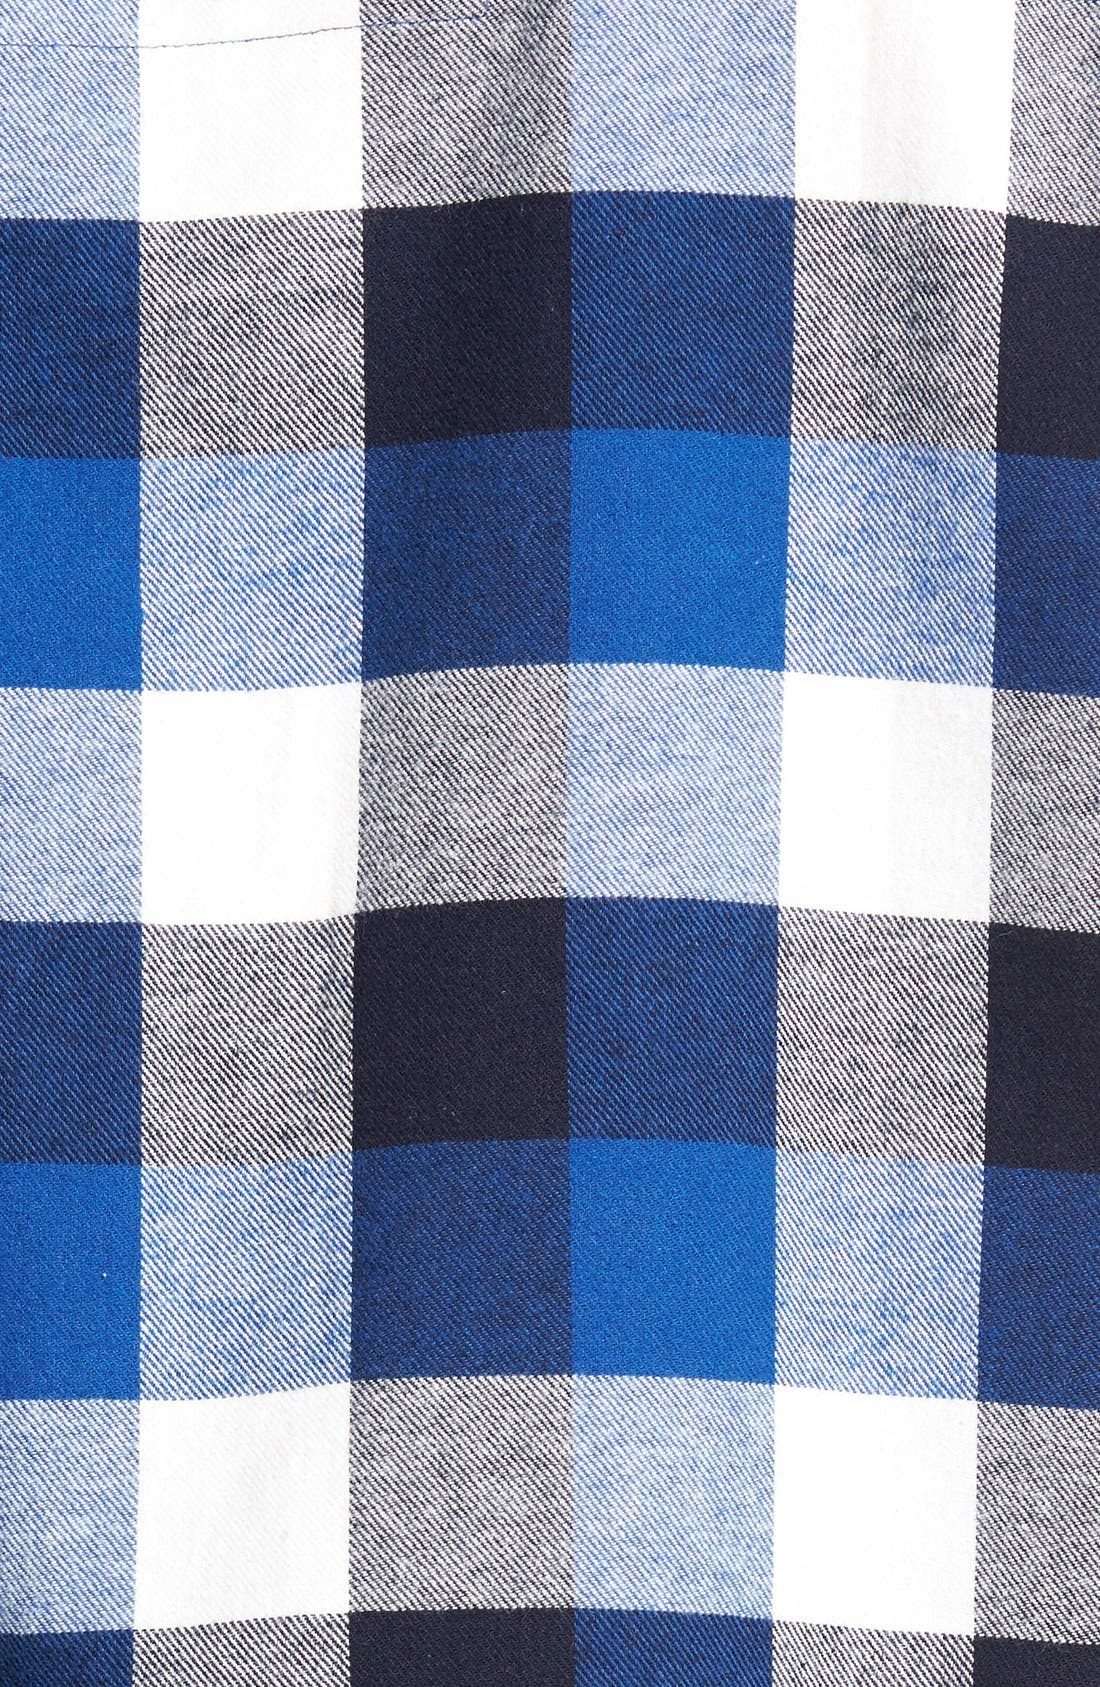 '824' Flannel Pajama Set,                             Alternate thumbnail 74, color,